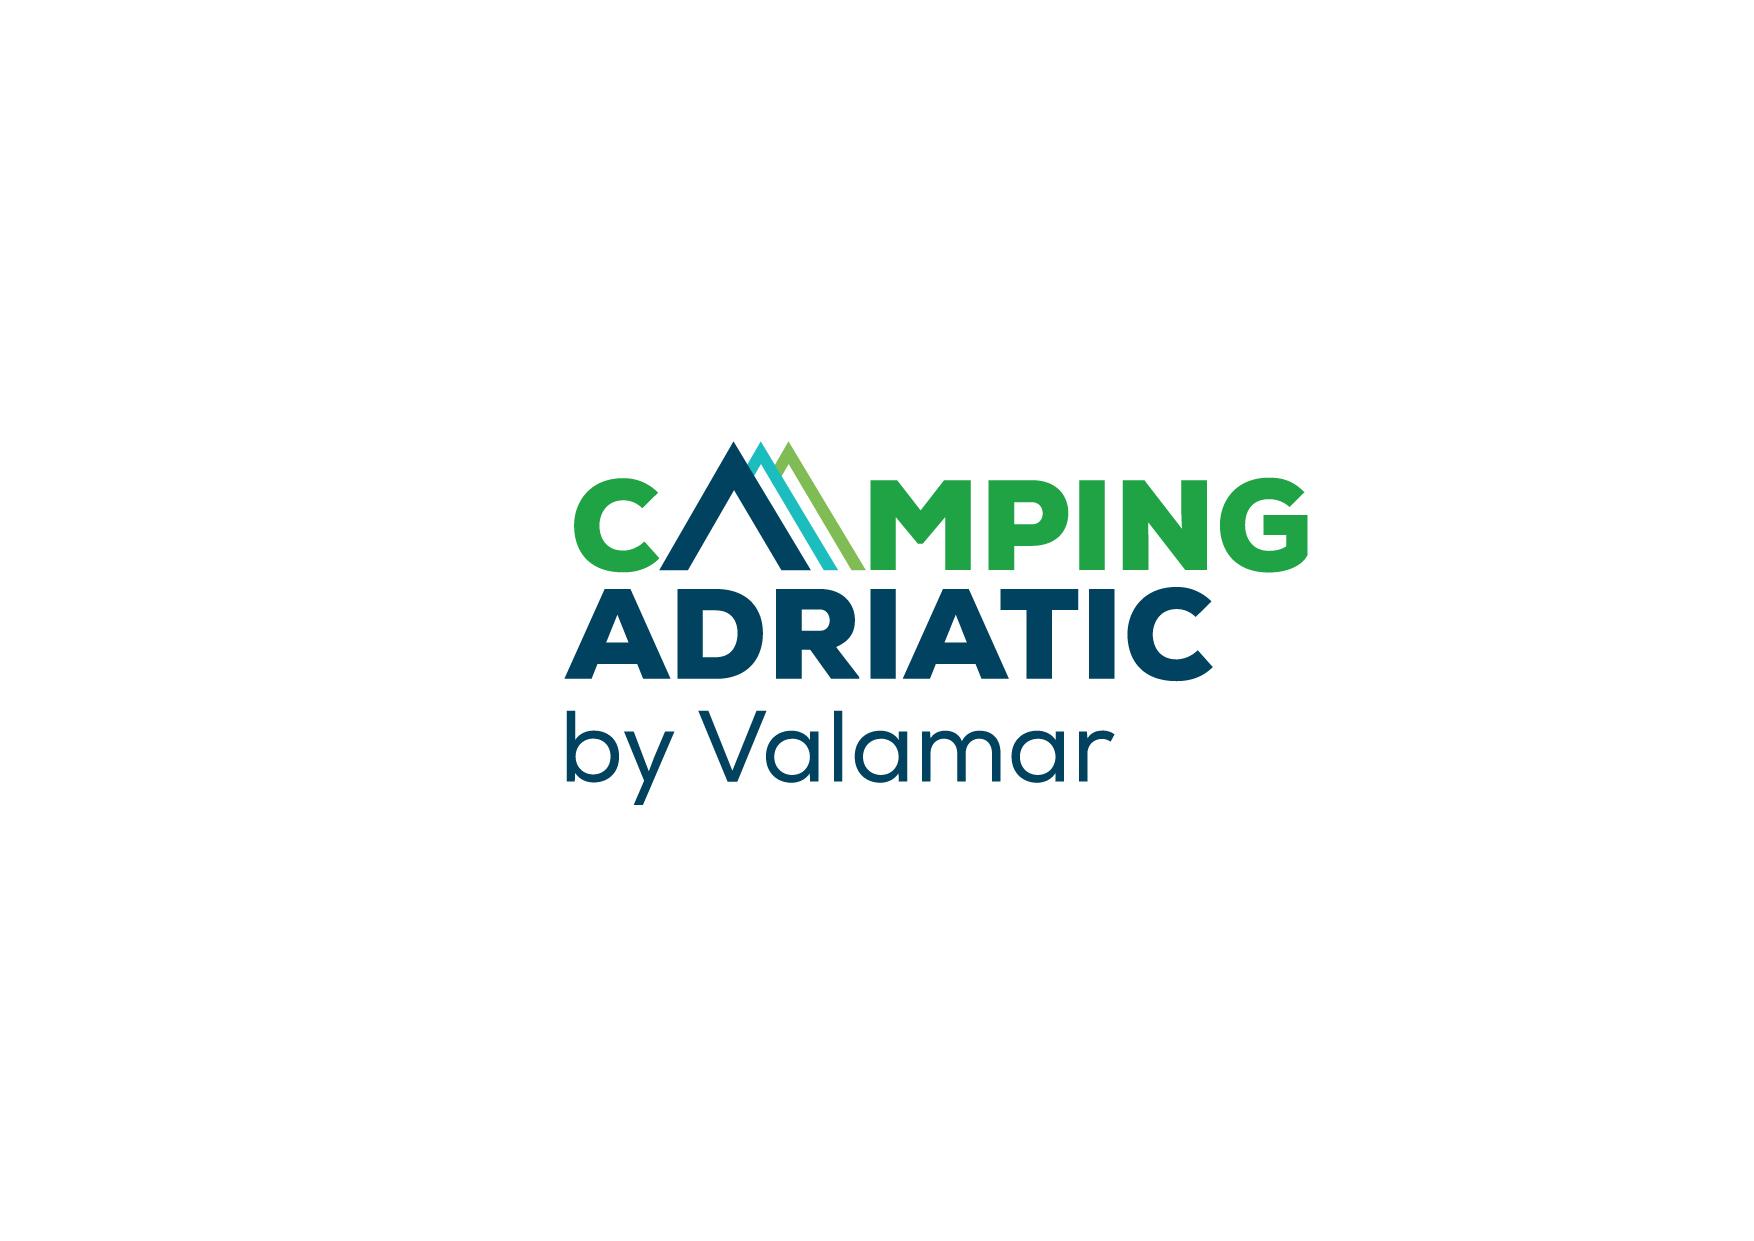 Solitudo Sunny Camping